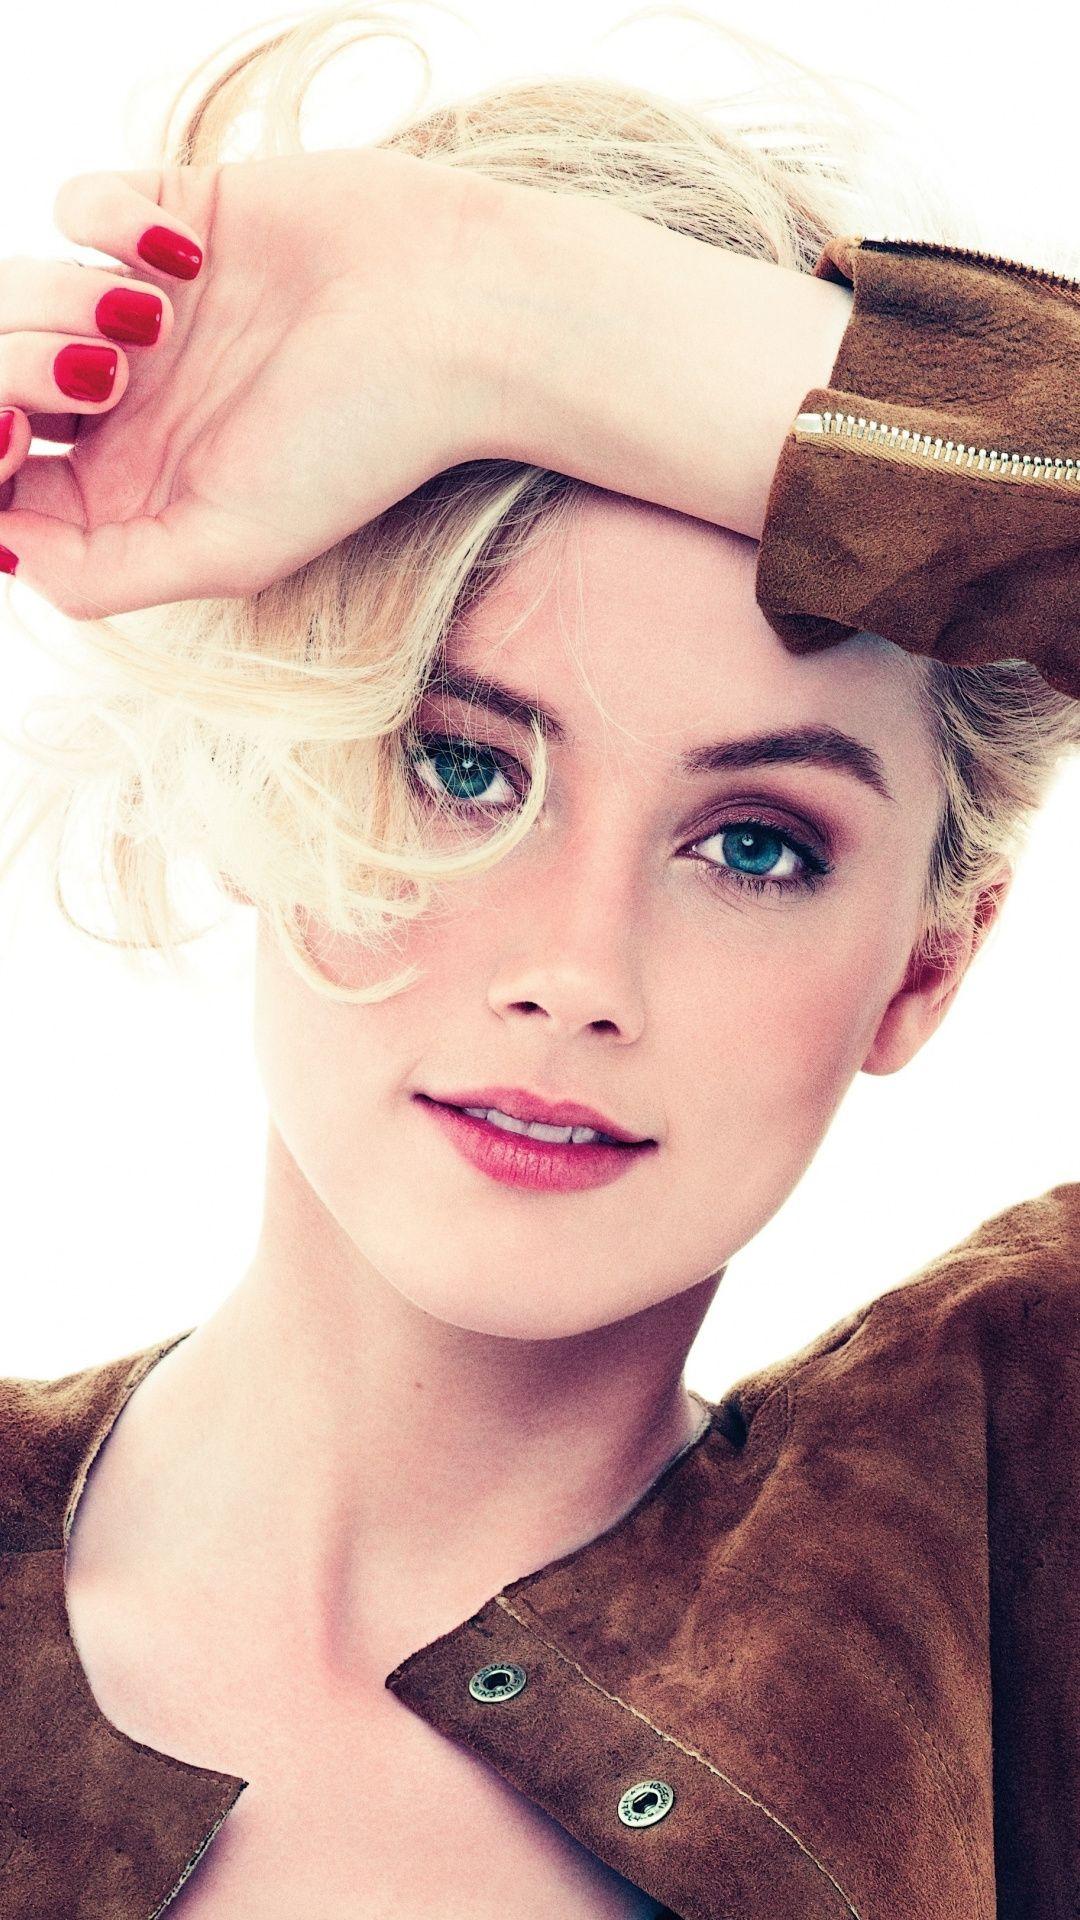 Amber Heard Beautiful Red Lips 2018 1080x1920 Wallpaper Amber Heard Wallpaper Amber Heard Brunette Amber Heard Style